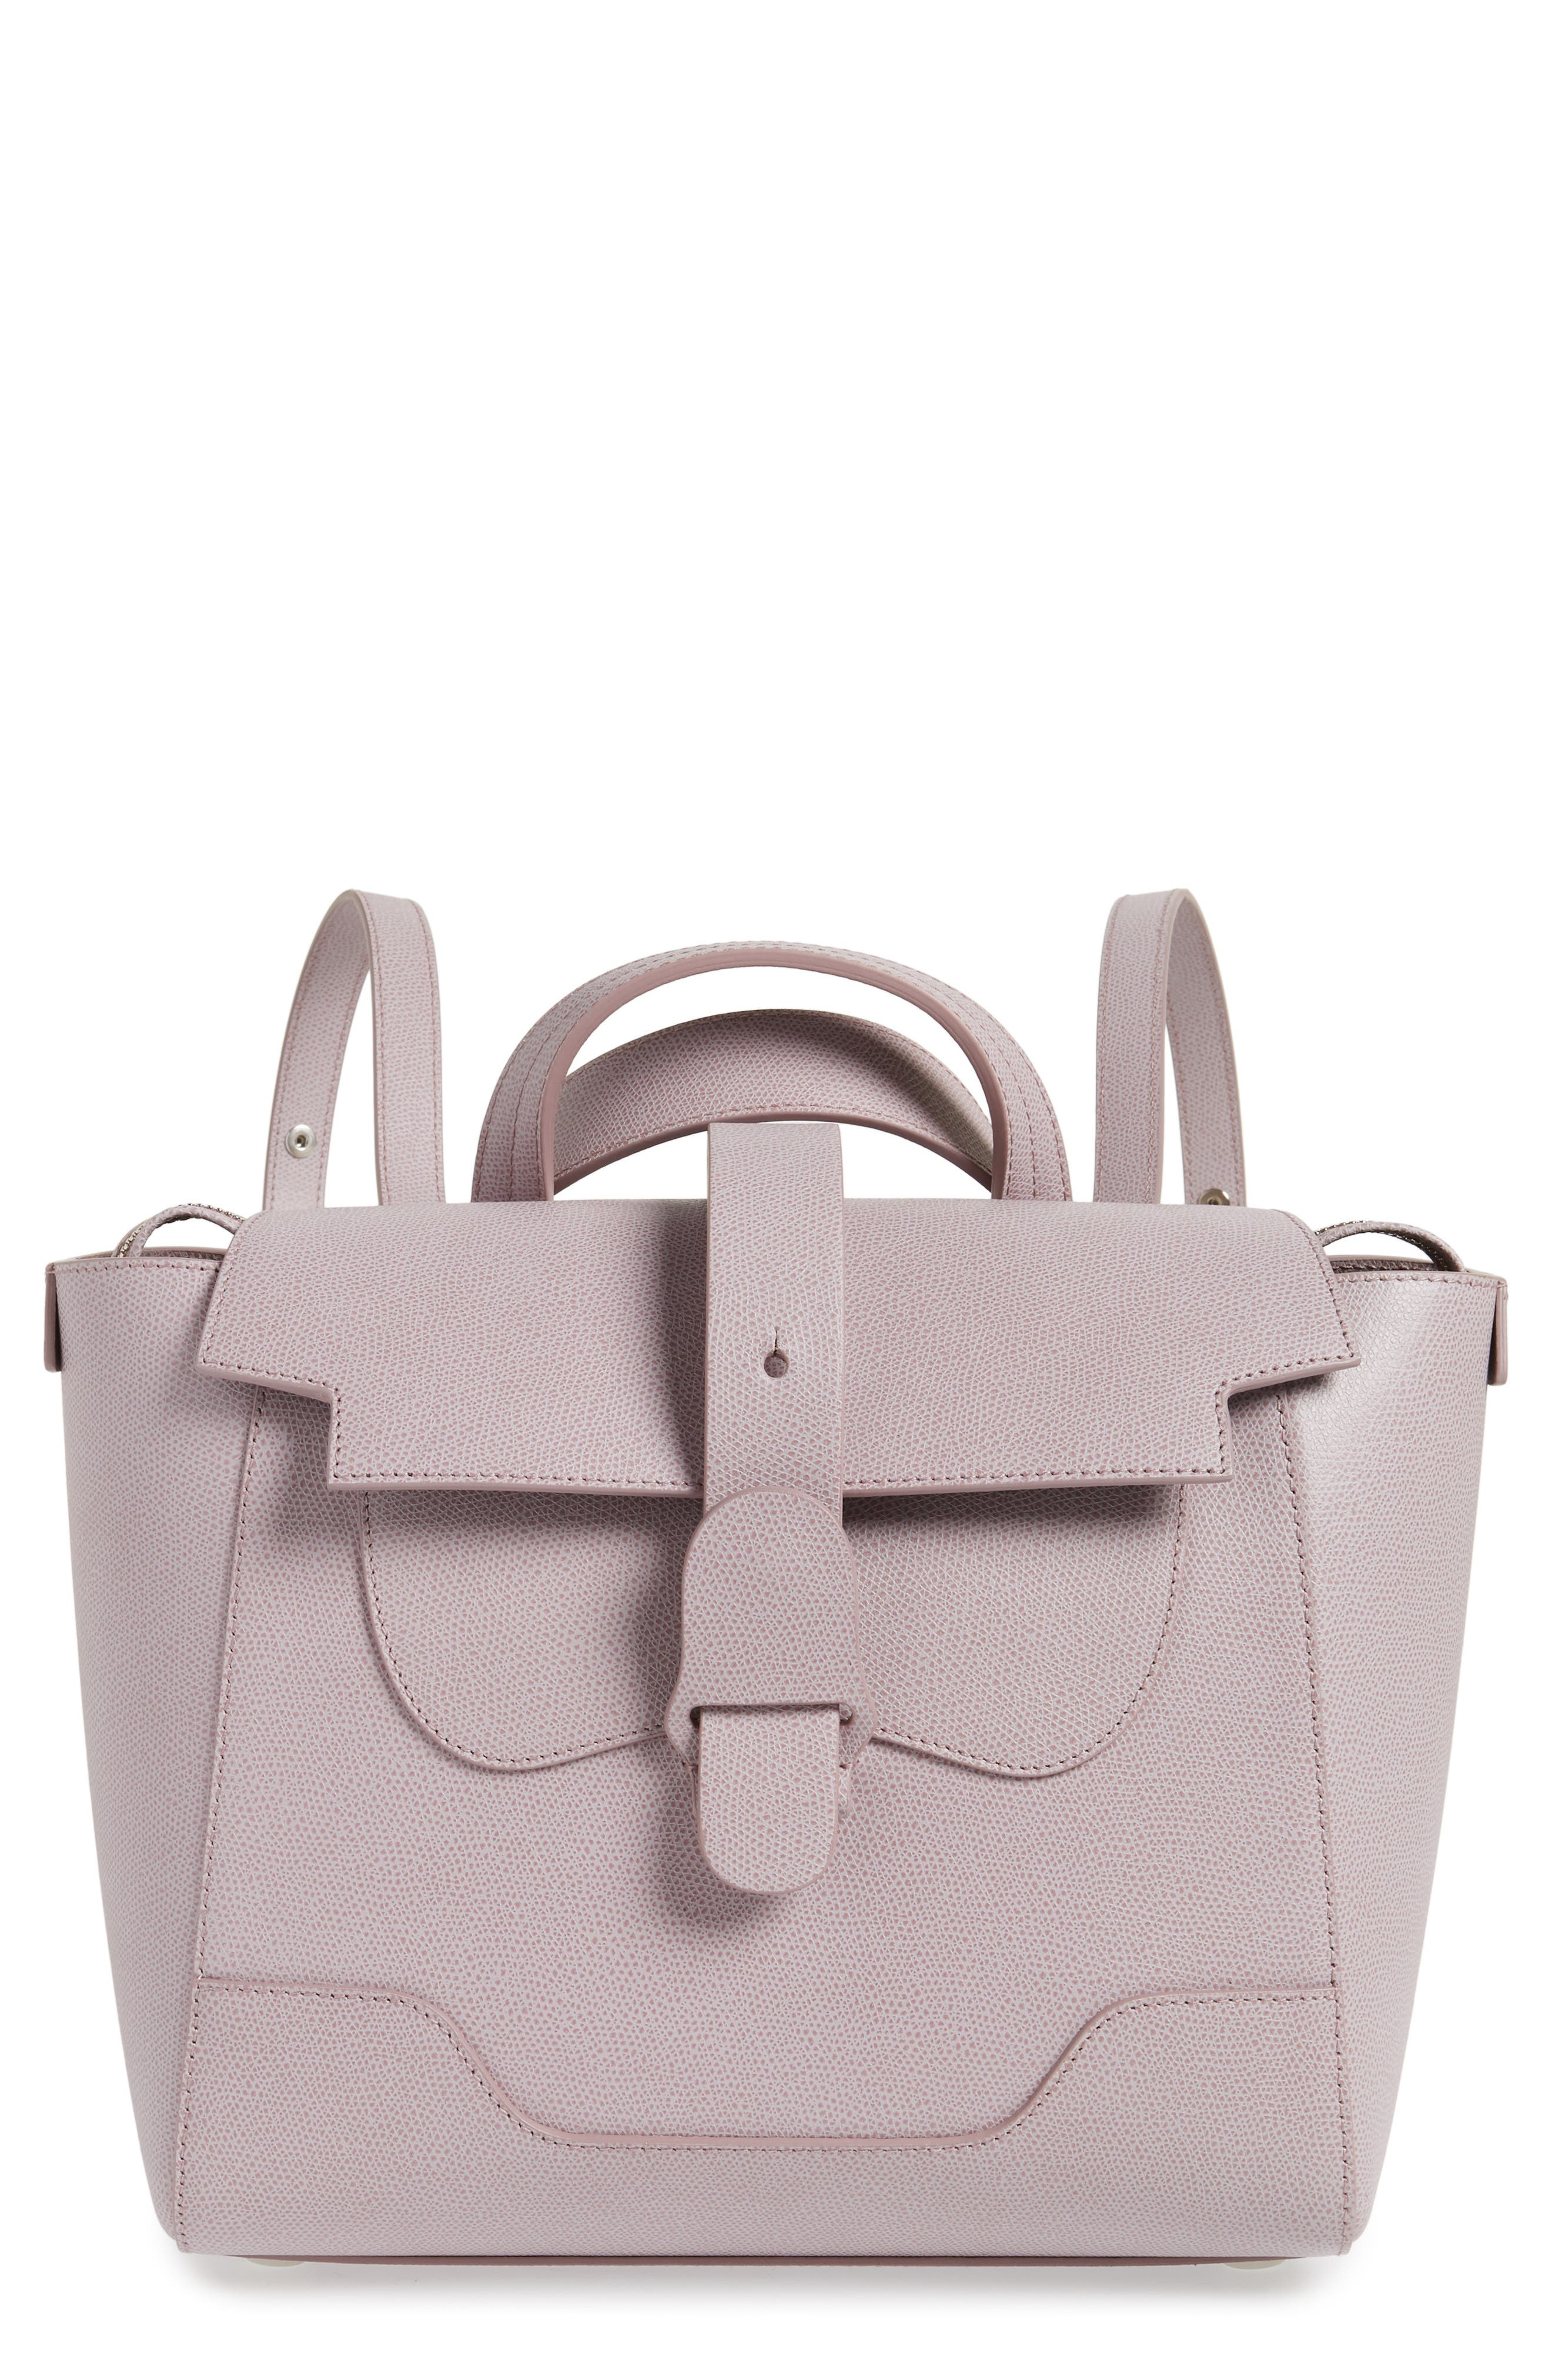 SENREVE Handbags   Wallets for Women  a7801a01dd